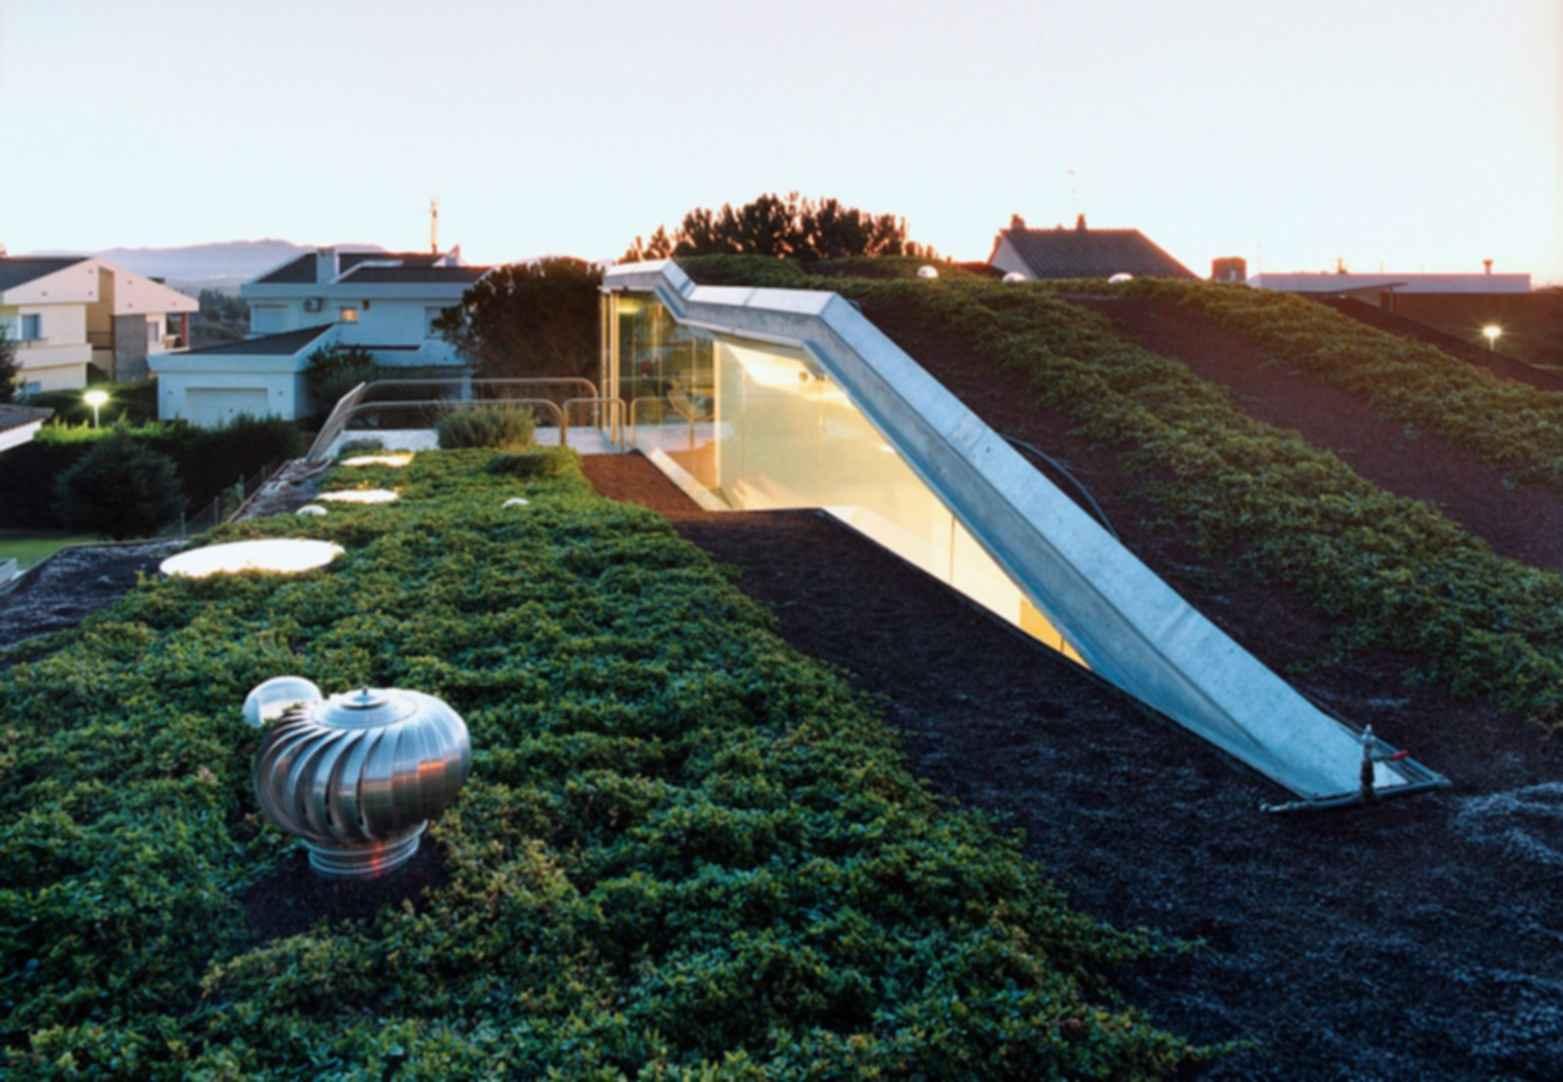 Villa Bio - Roof